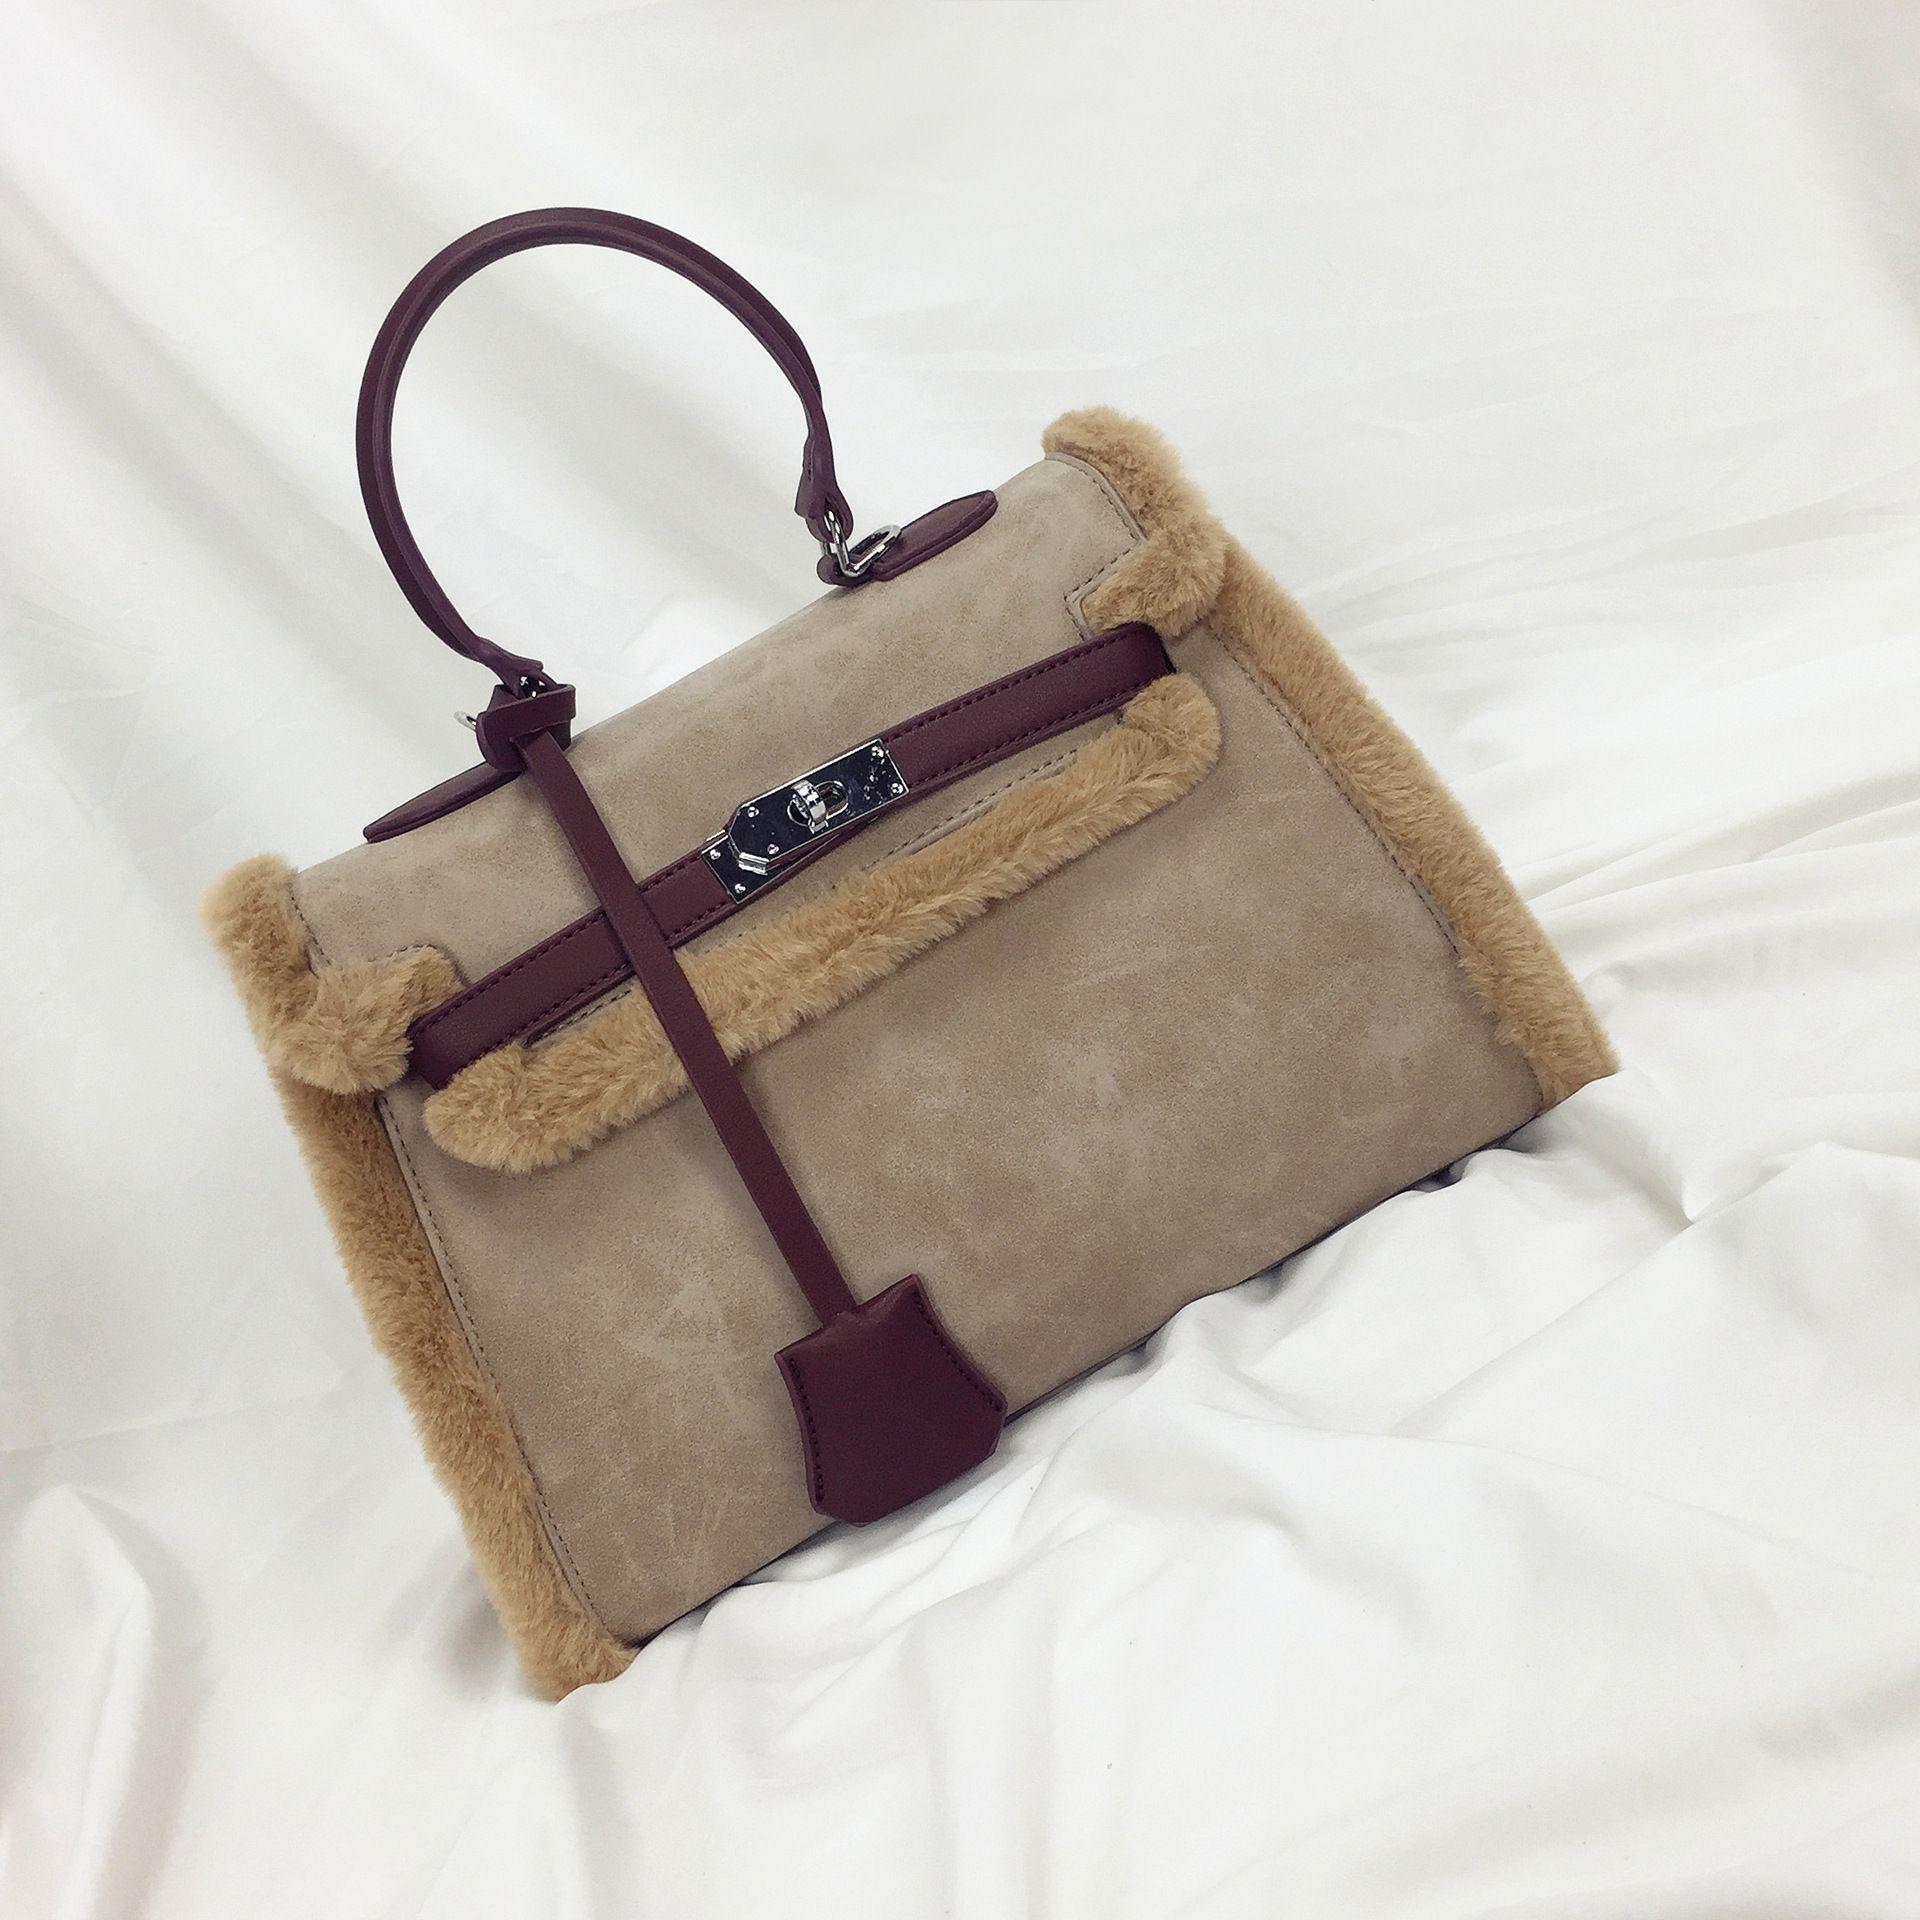 2ecb6bcfaac Pink sugao designer handbag bags purses tote bags luxury handbags fashion  designer bags famous brand women bag tote large capacity bag purse